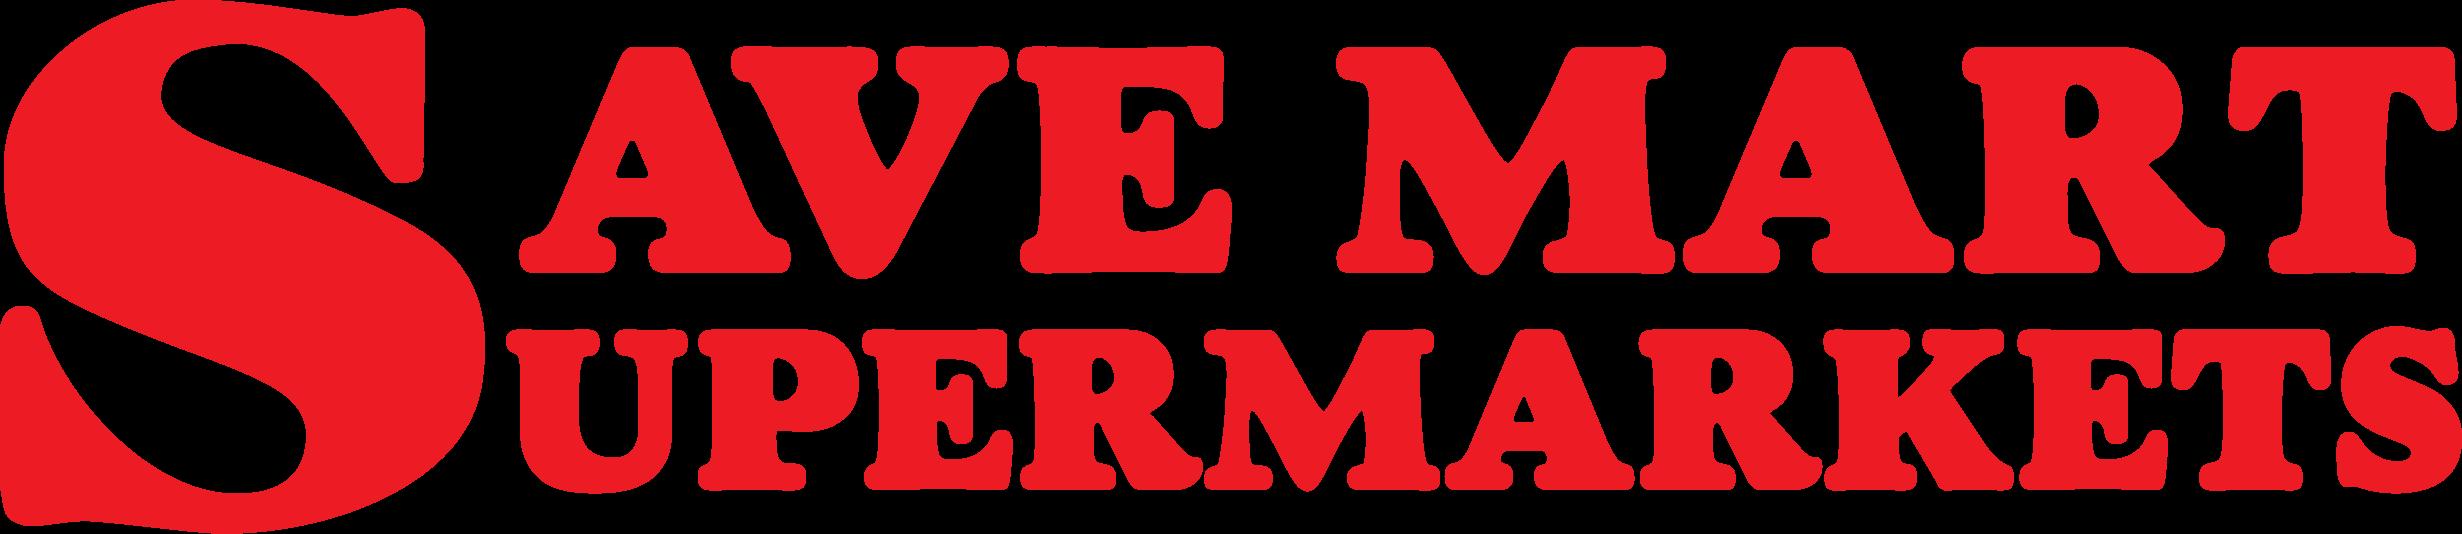 https://norcalnaturallyspecialfoodbroker.com/wp-content/uploads/2019/02/SaveMart_logo.png